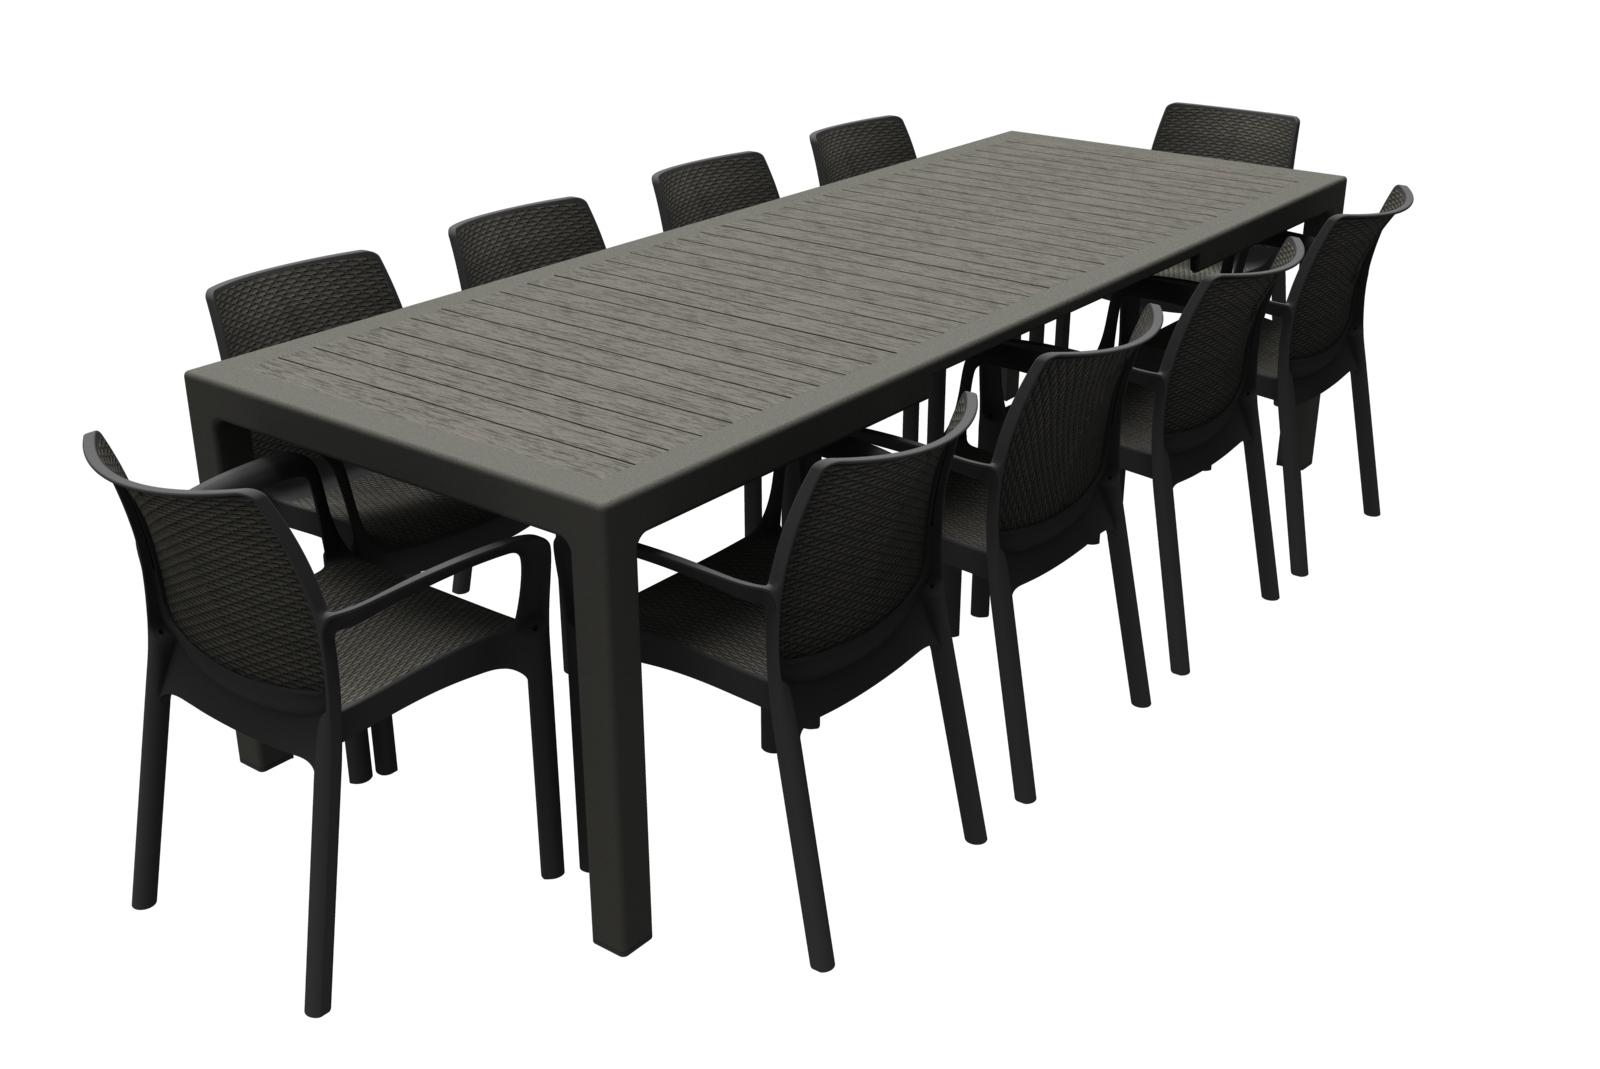 Záhradný stôl - Allibert - Sonata 2 antracit